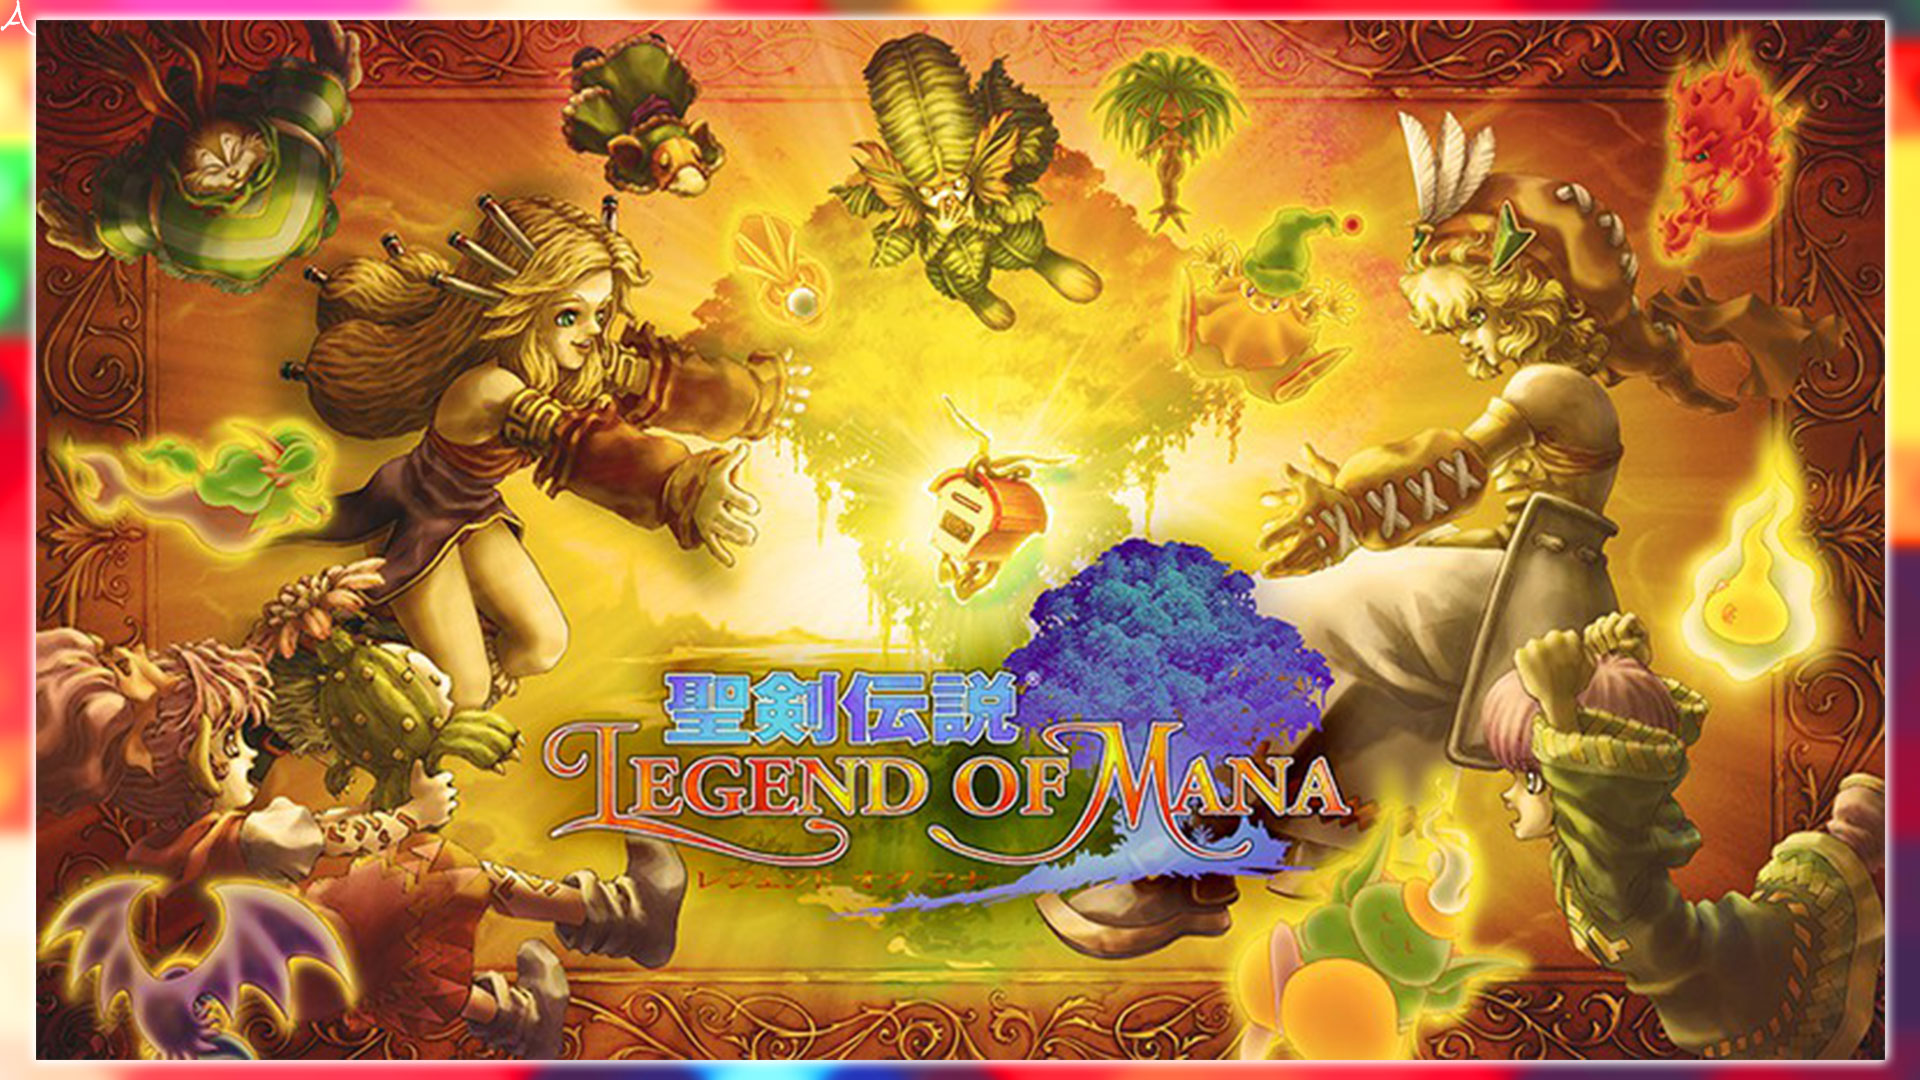 PC版「聖剣伝説 Legend of Mana」に必要な最低/推奨スペックを確認